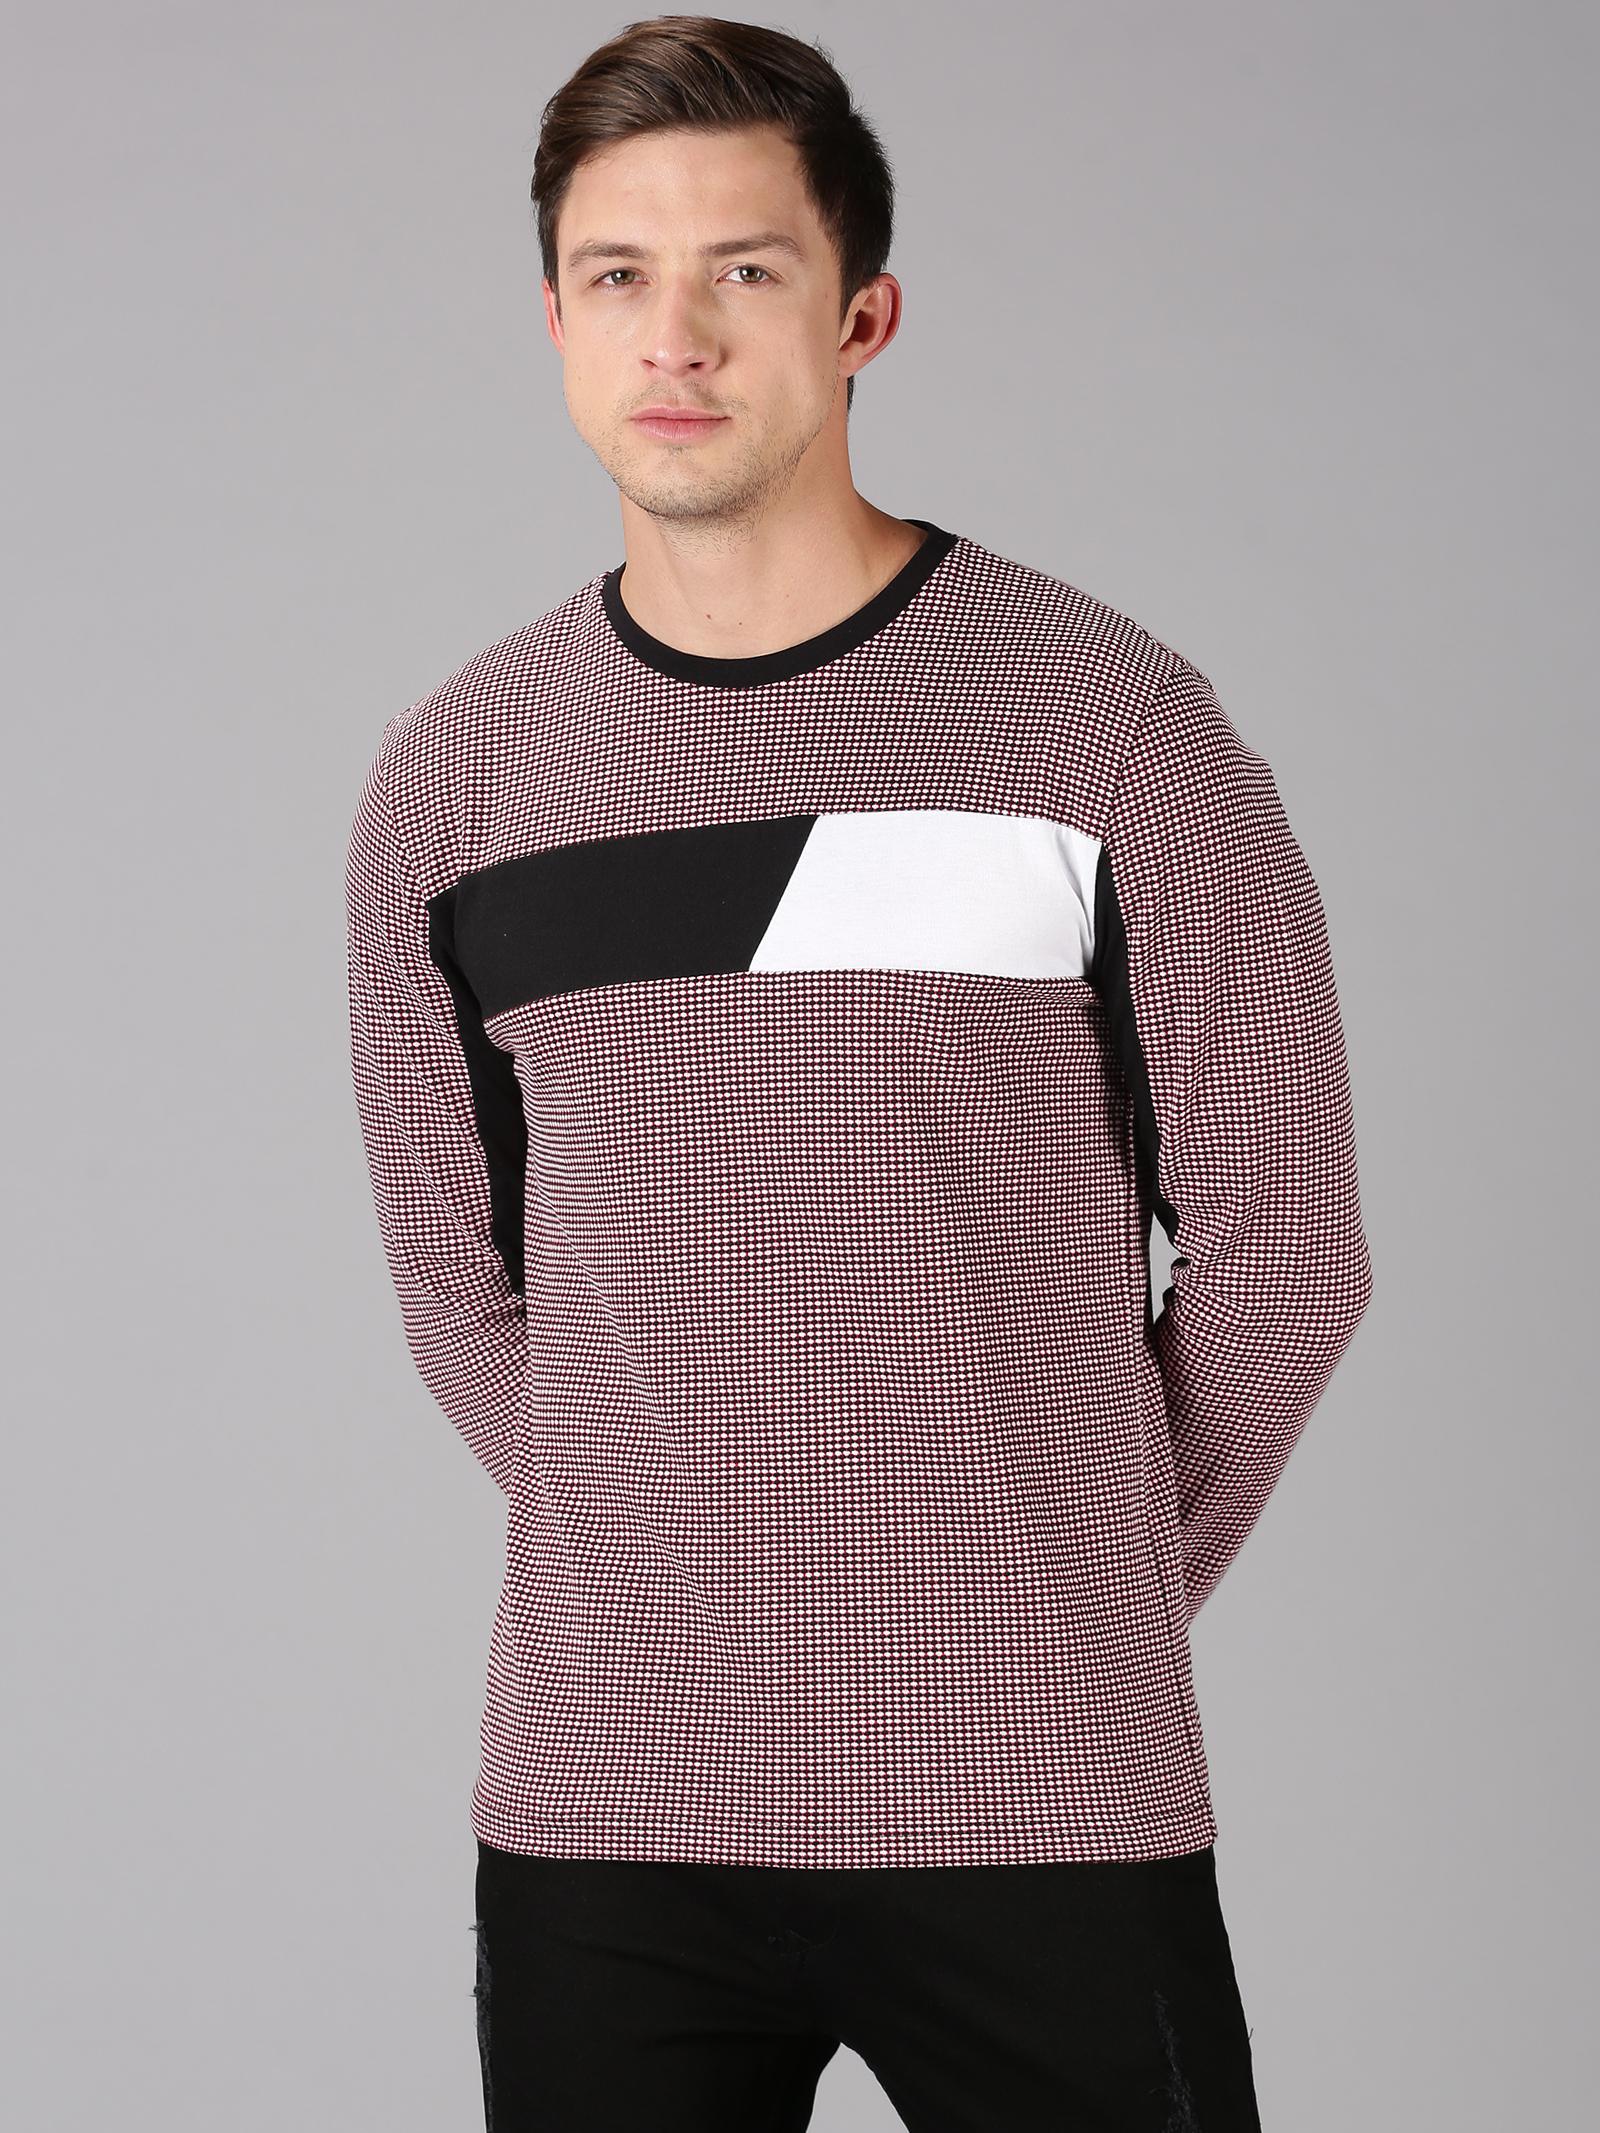 UrGear | UrGear Color Block Men Round Neck White, Black, Maroon T-Shirt